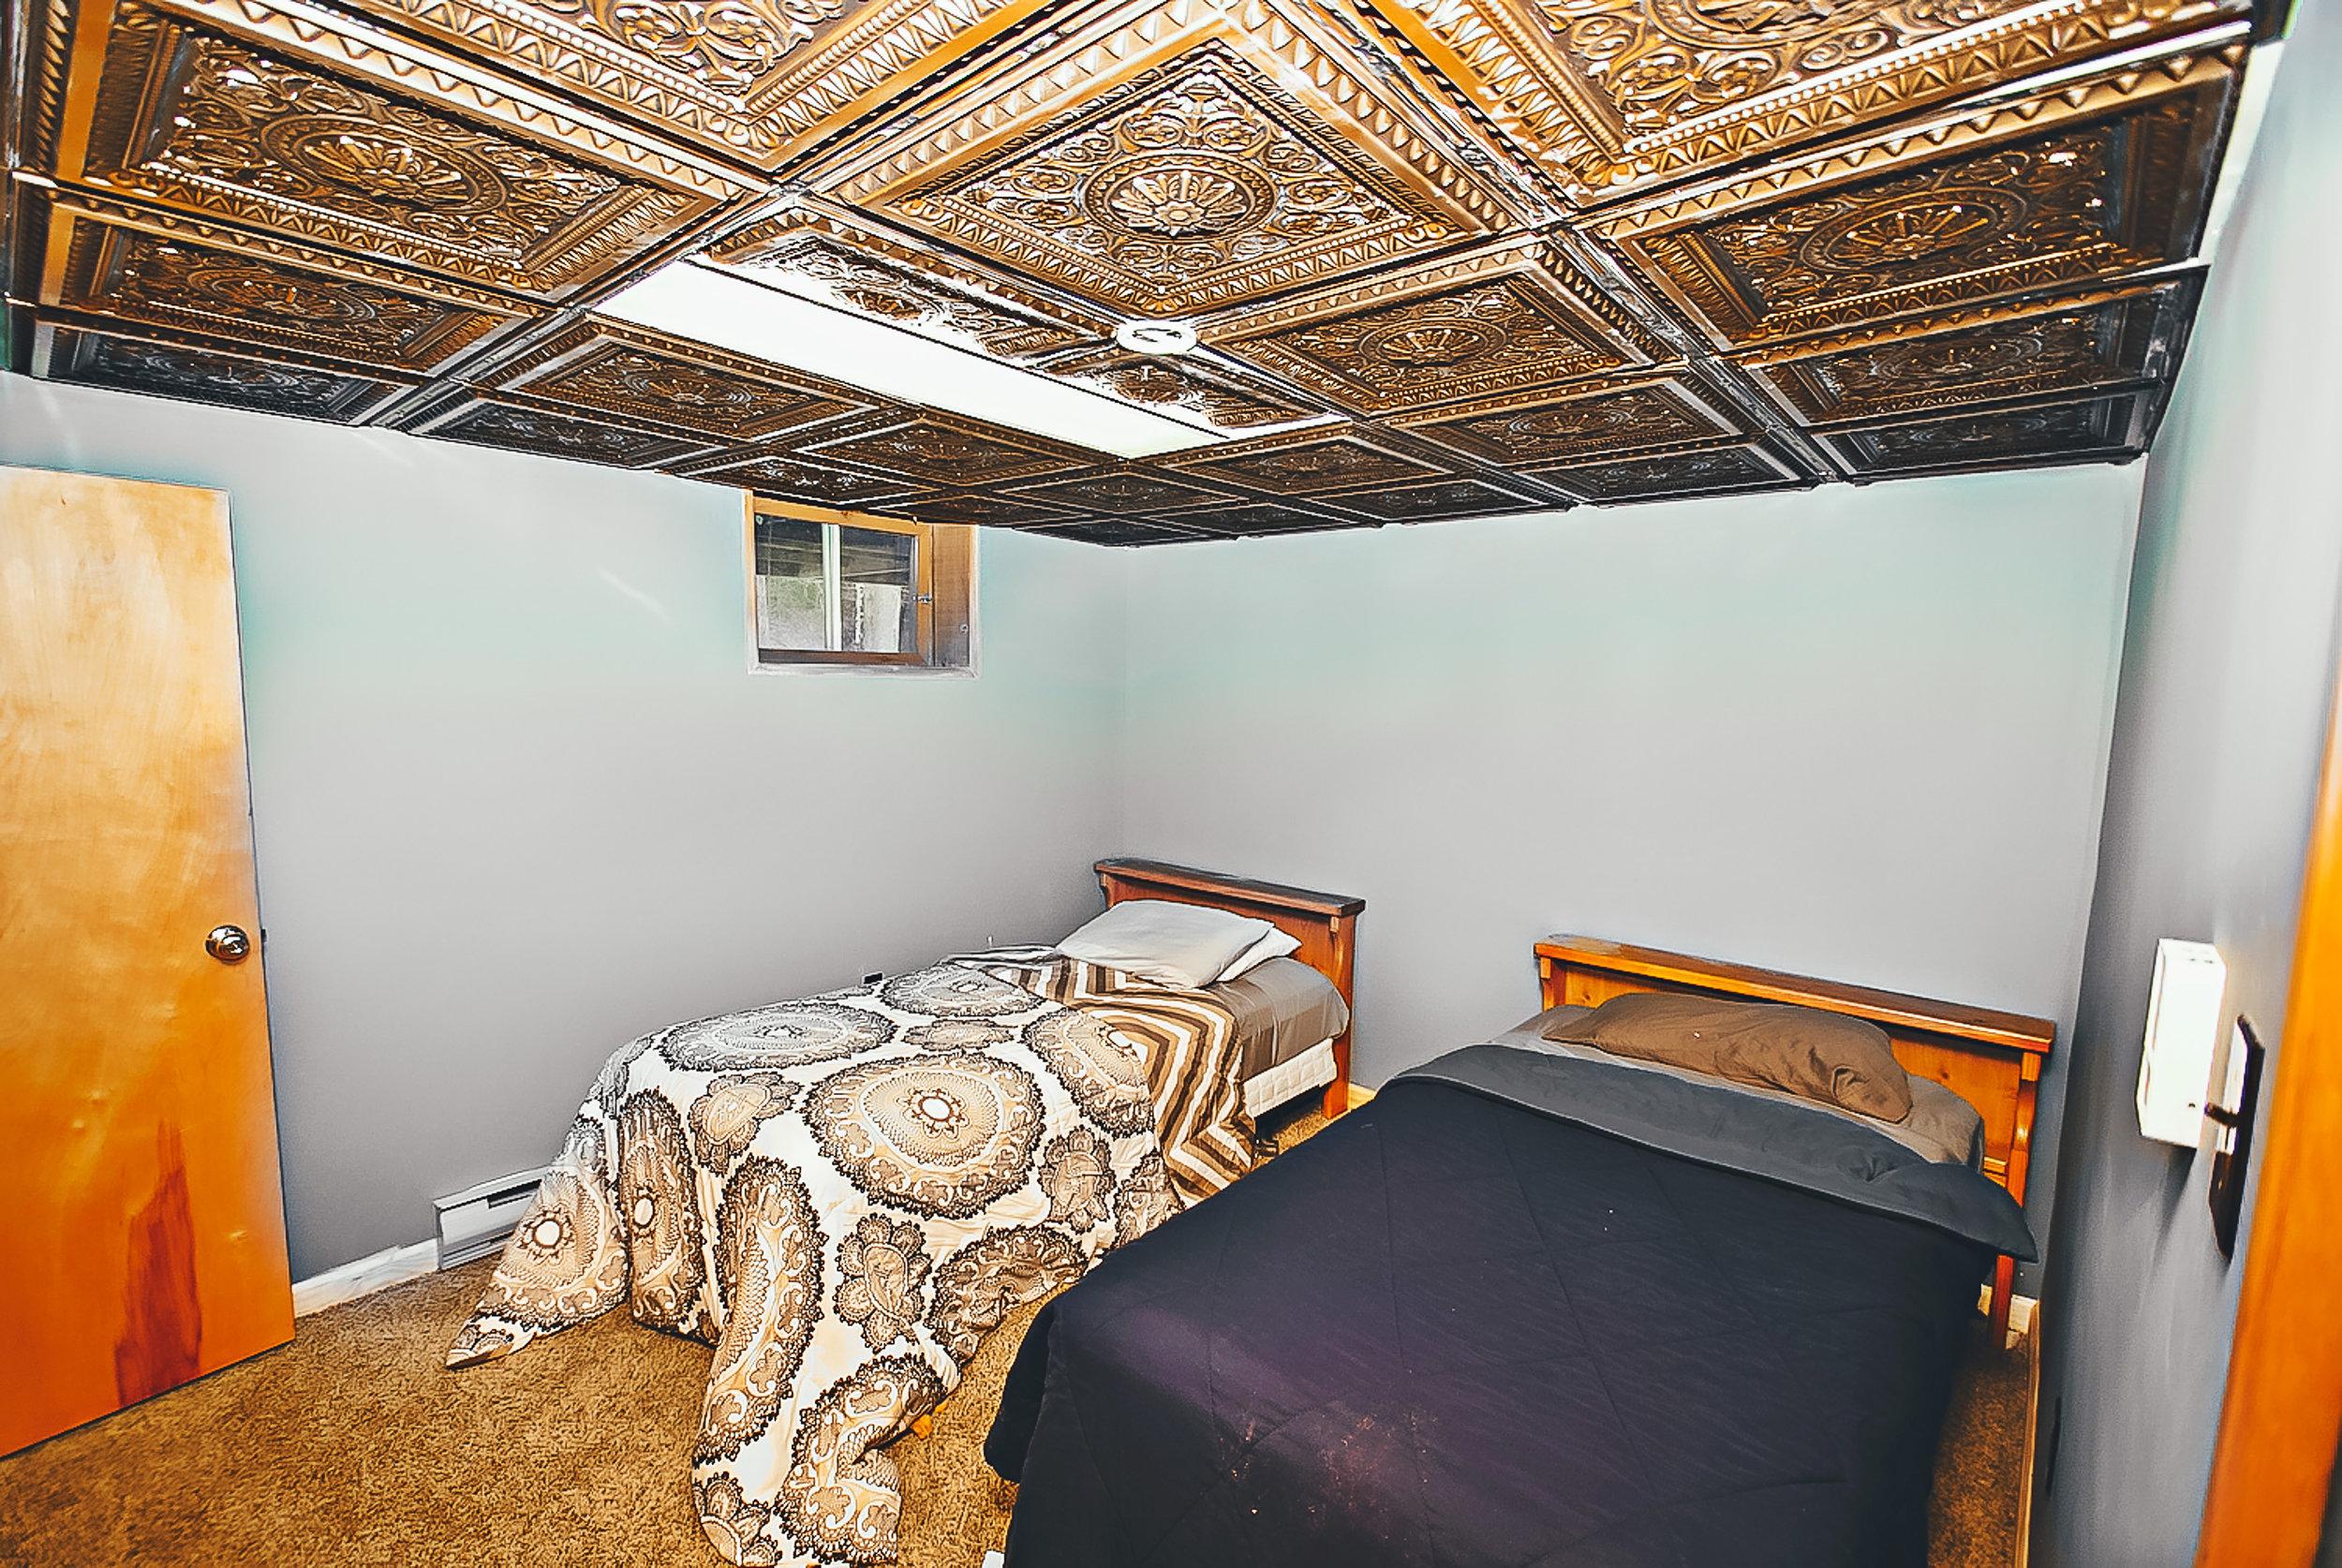 Bedroom+(6).jpg